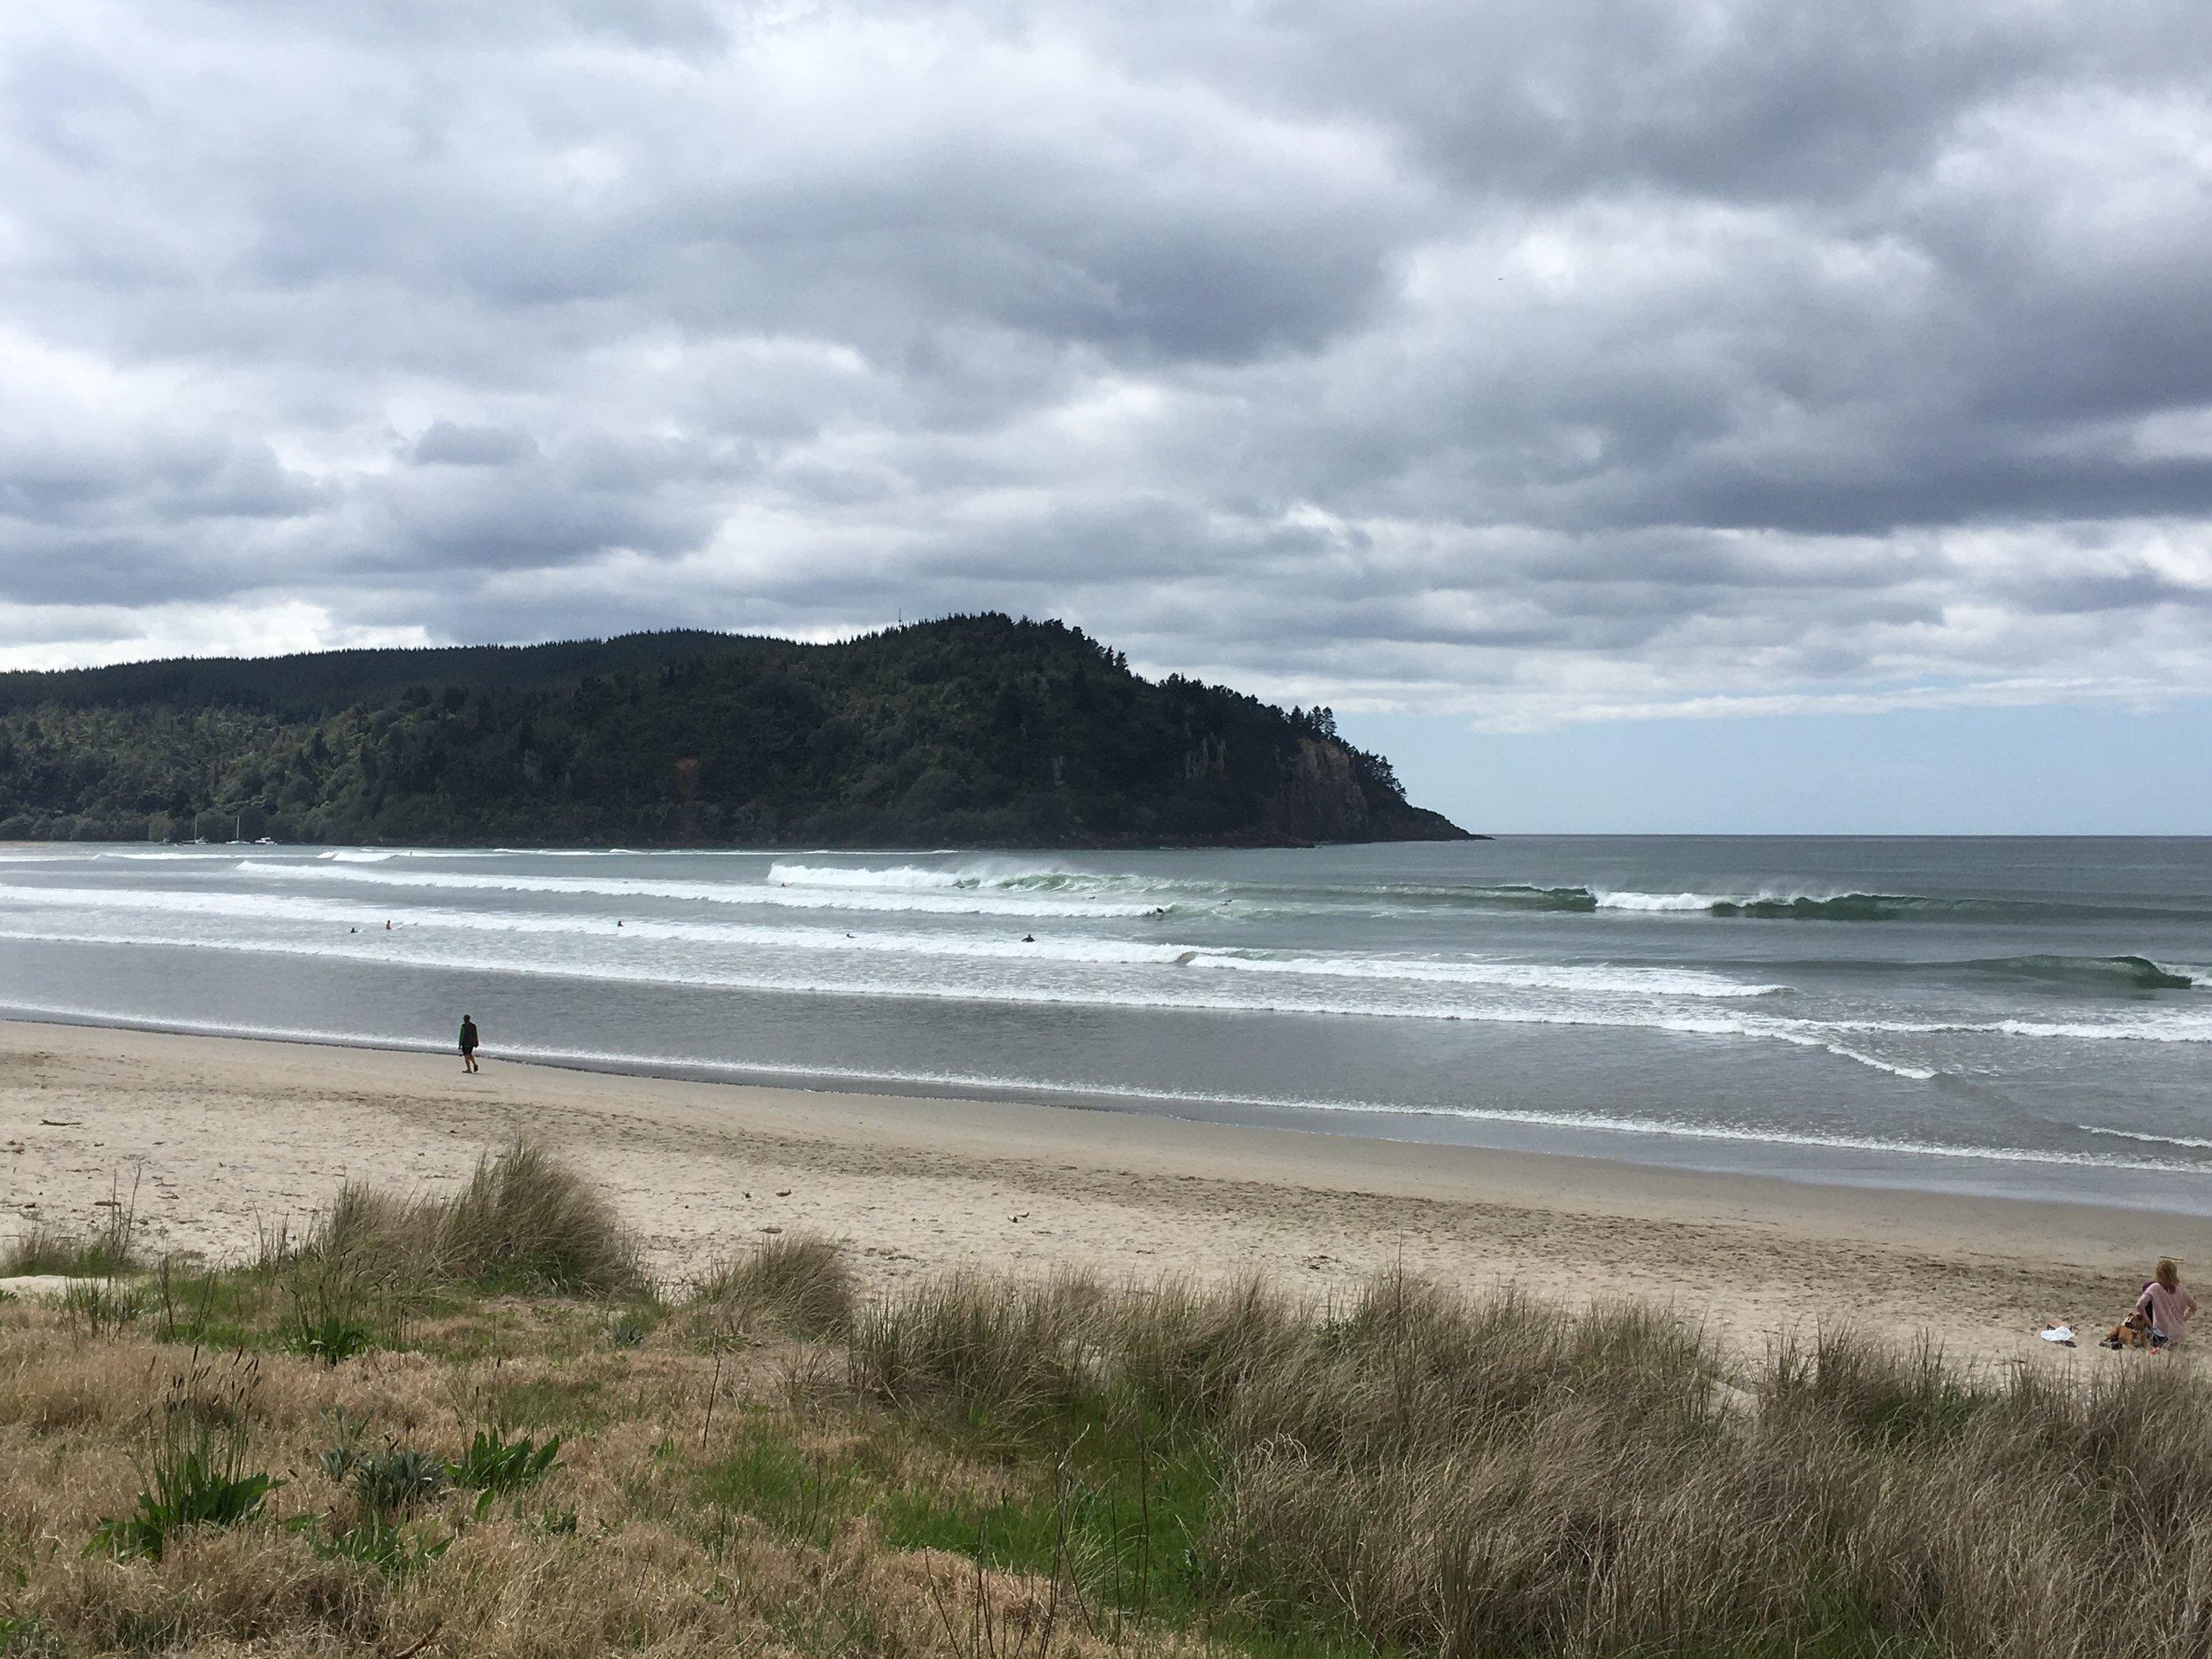 The surf at Whangamata Beach on Sunday